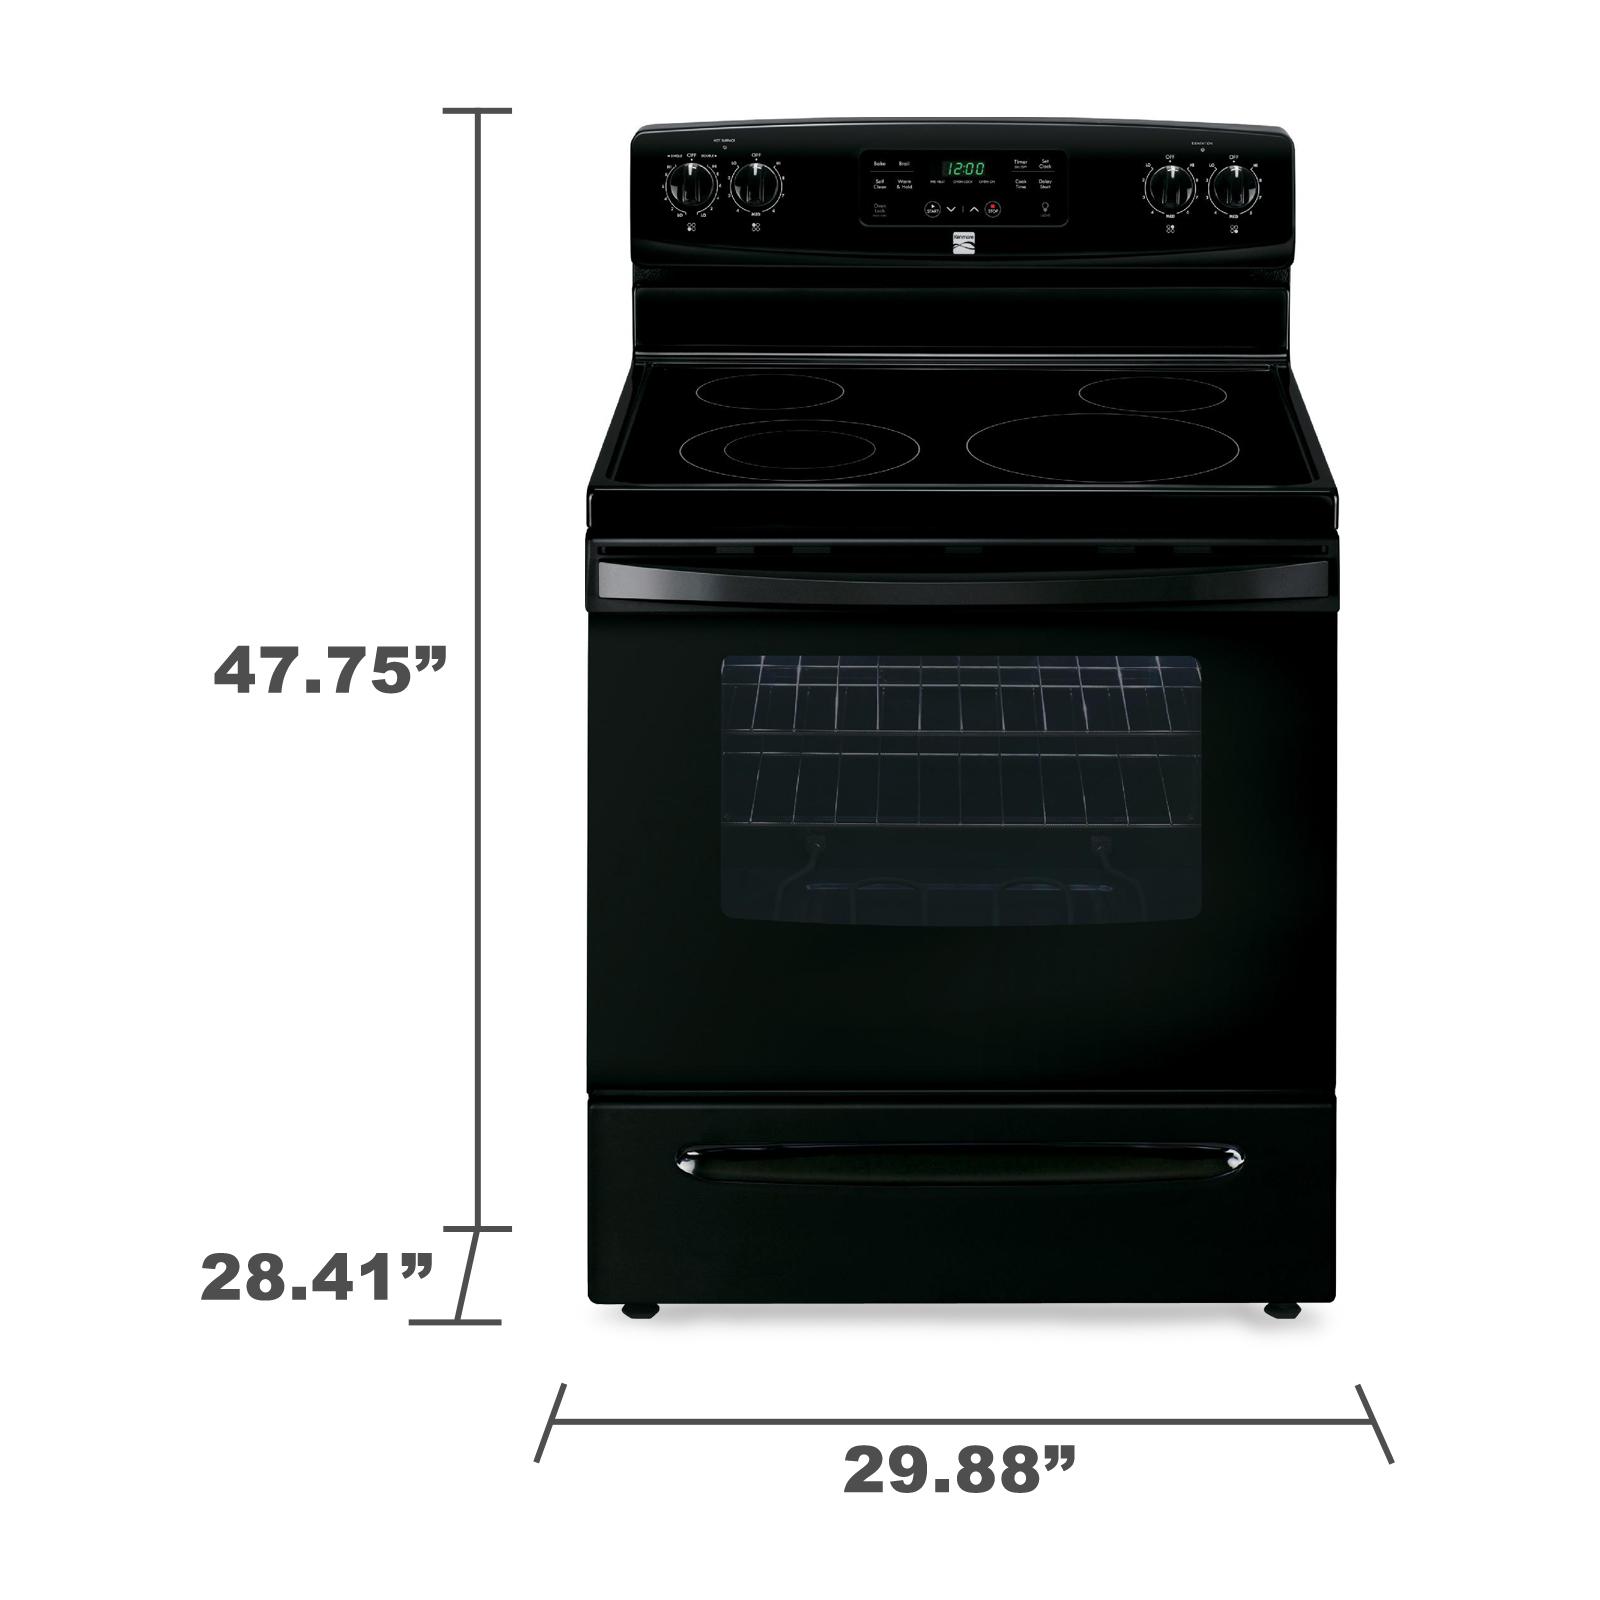 Kenmore 94179 5.3 cu. ft. Self-Cleaning Electric Range - Black